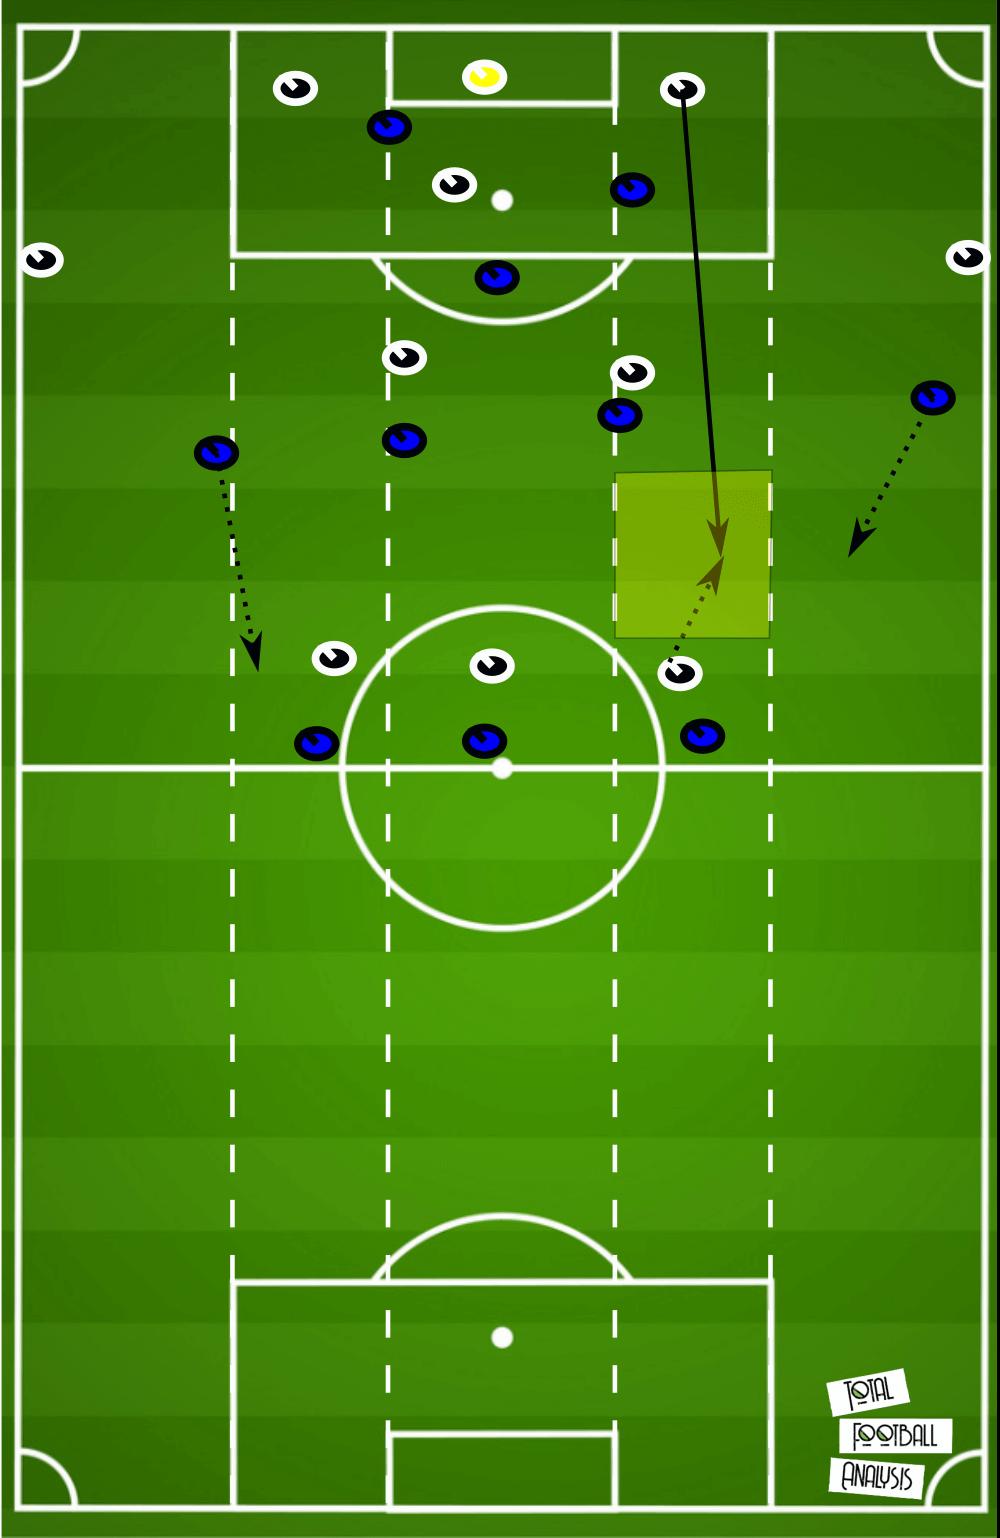 UEFA Champions League 2020/21: Inter vs Borussia Mönchengladbach - tactical analysis tactics